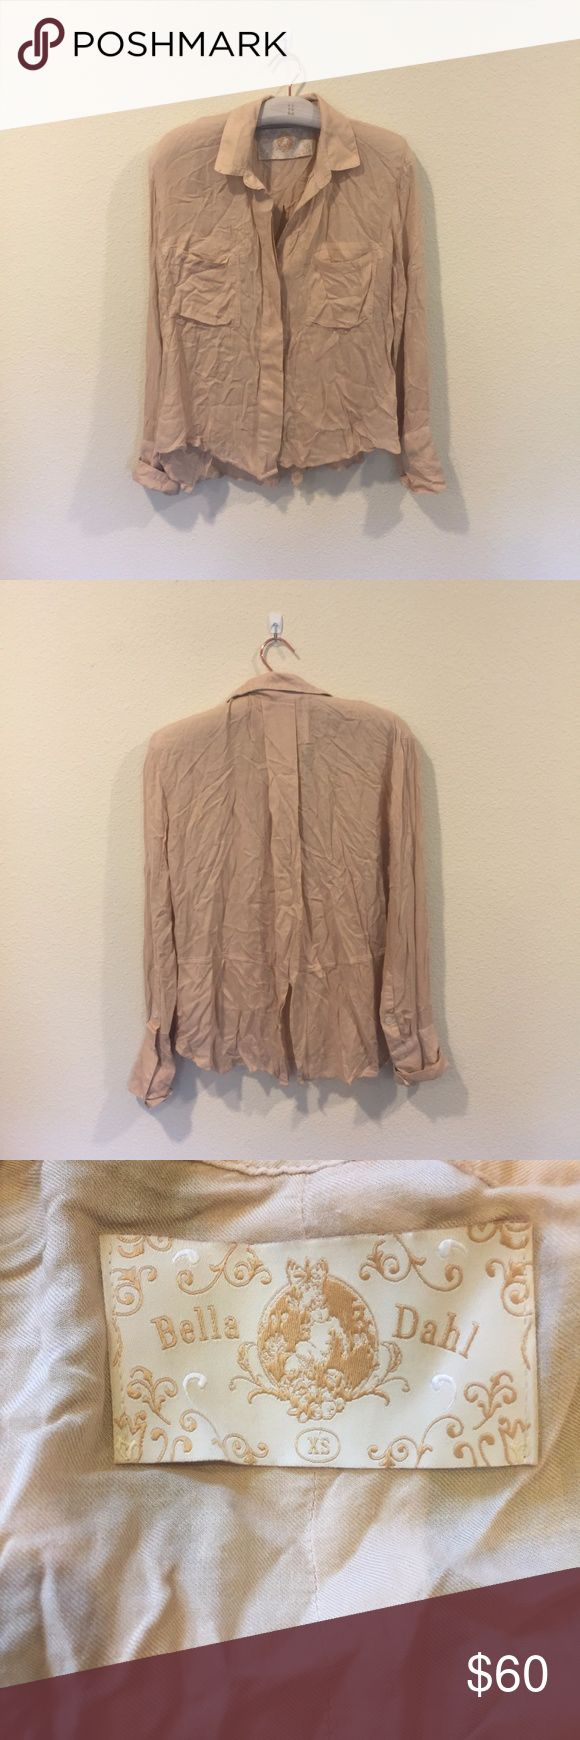 Bella Dahl button down tan shirt Perfect closet staple! From the So Sage blog. No trades. Bella Dahl Tops Button Down Shirts